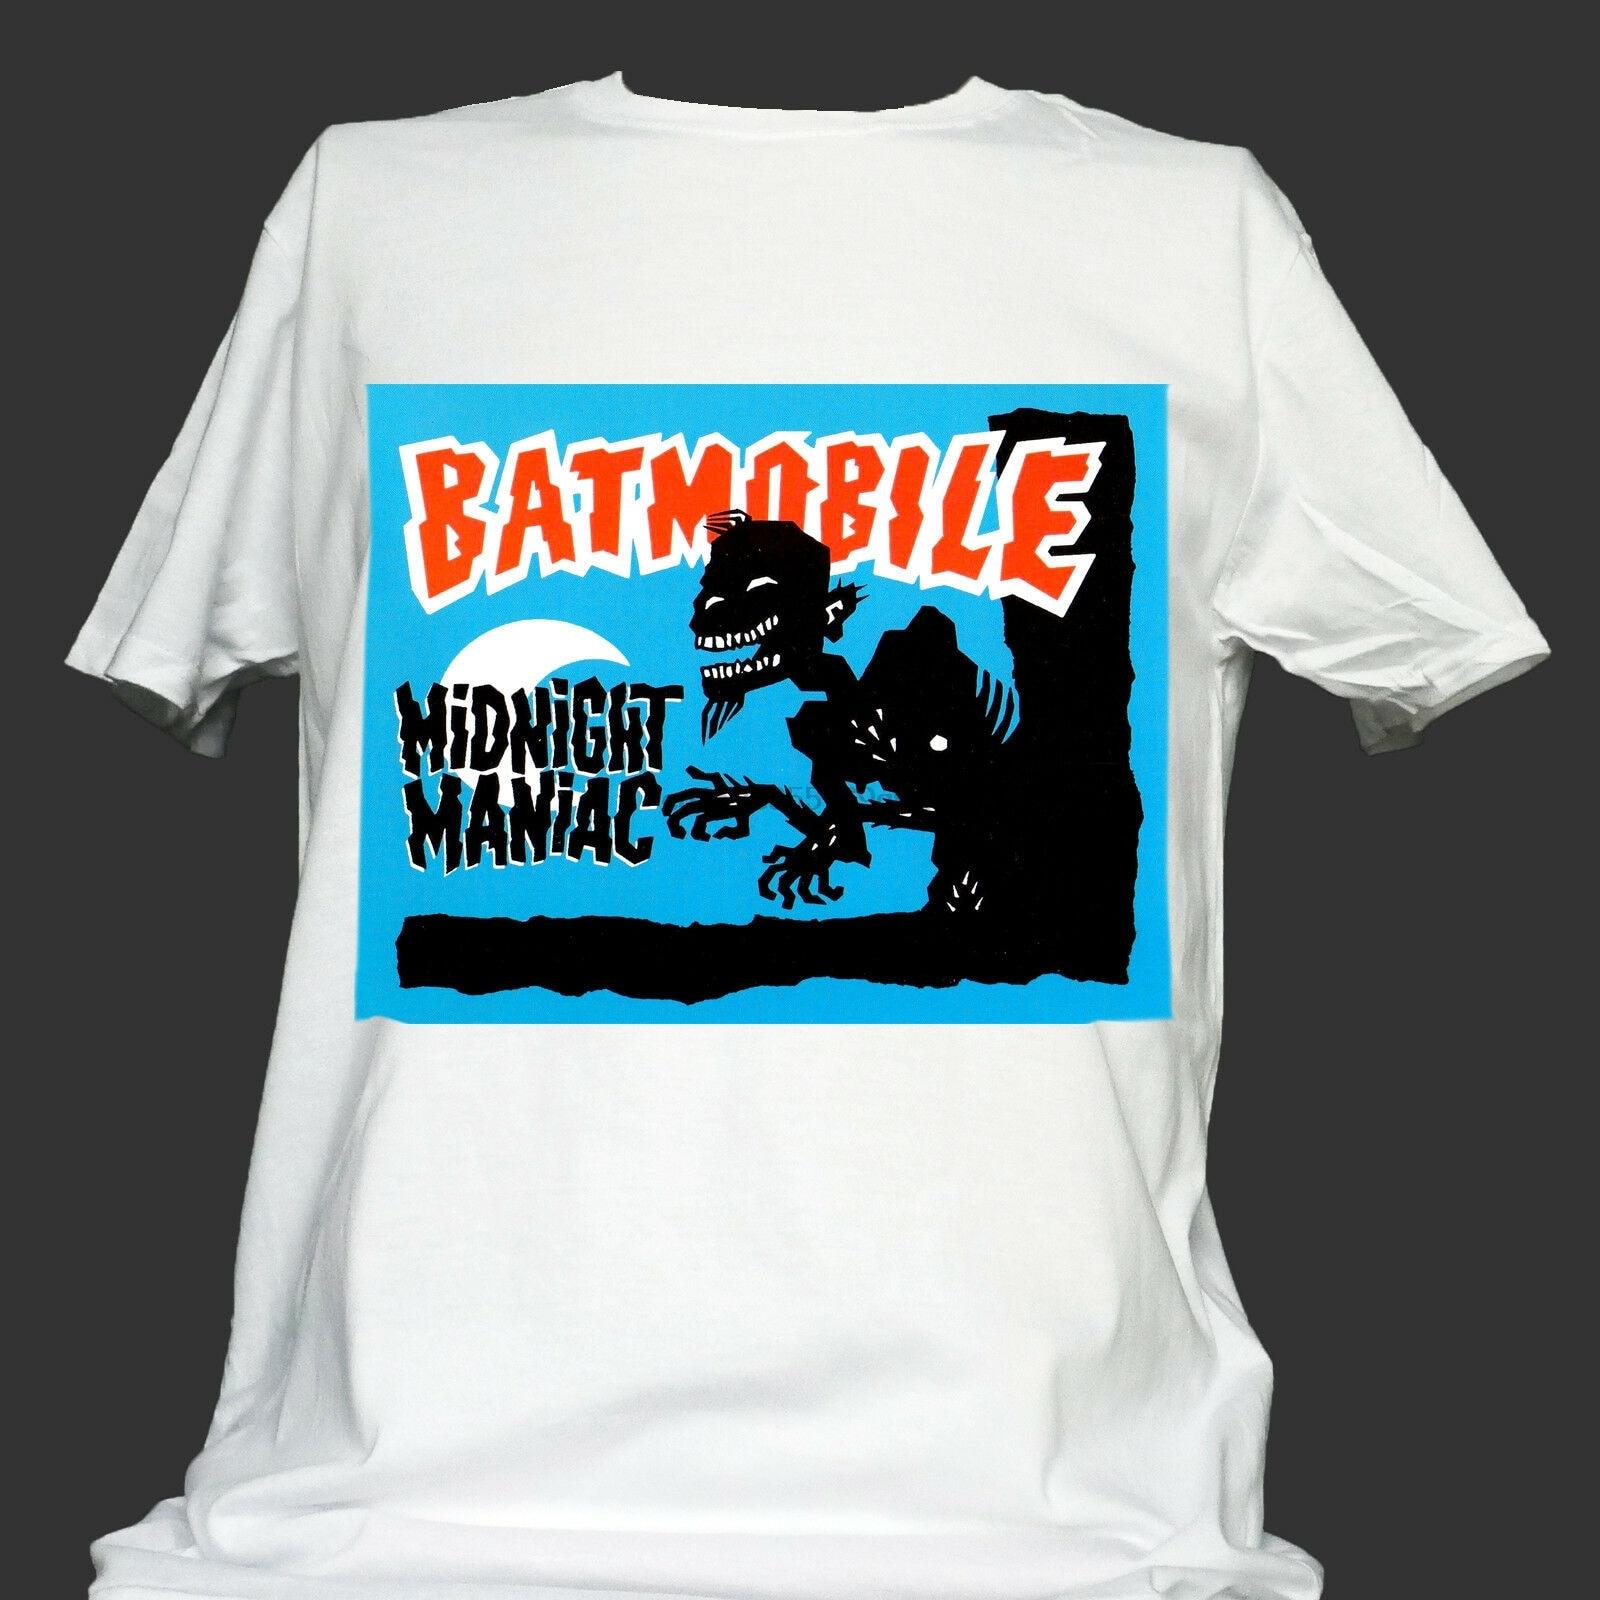 Бэтмобиль PSYCHOBILLY футболка mad sin meteors guana batz унисекс S-3XL (1)